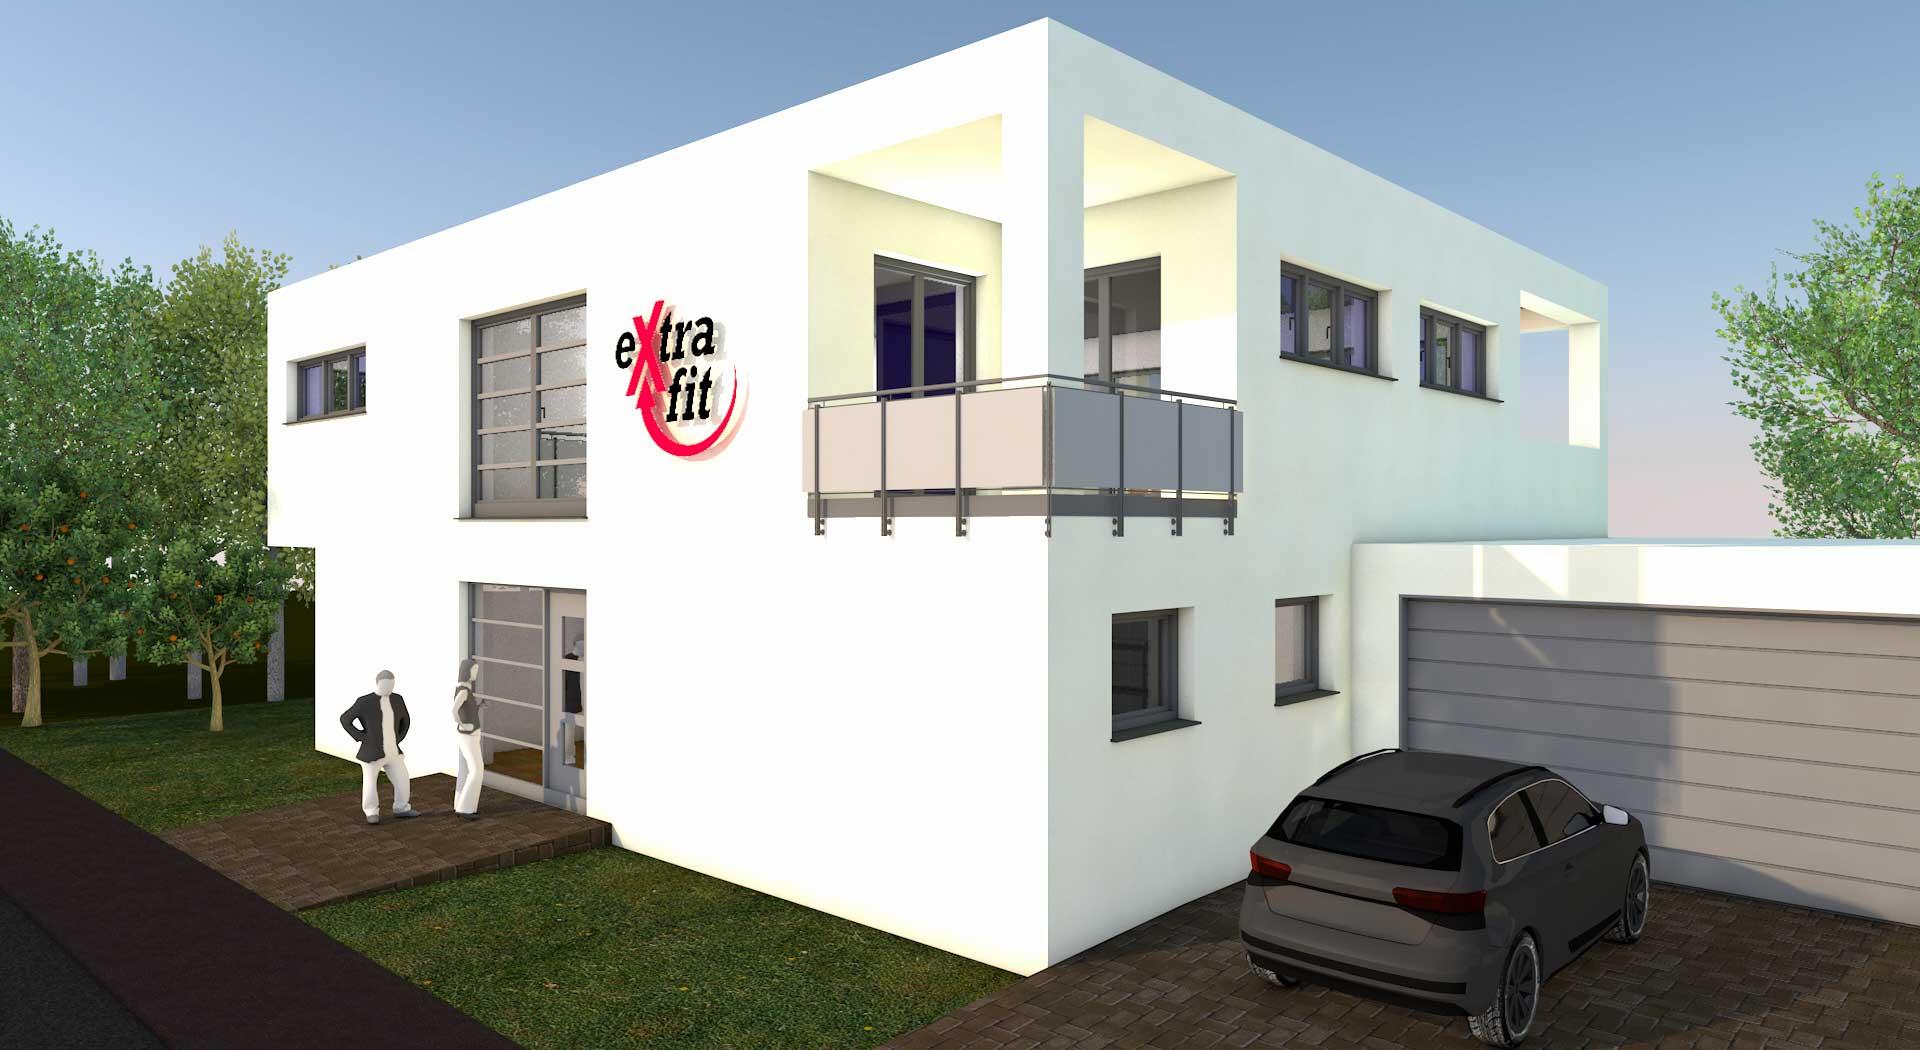 haus sun exclusiv vip extrafit 2016 11 08 a bild strasse. Black Bedroom Furniture Sets. Home Design Ideas